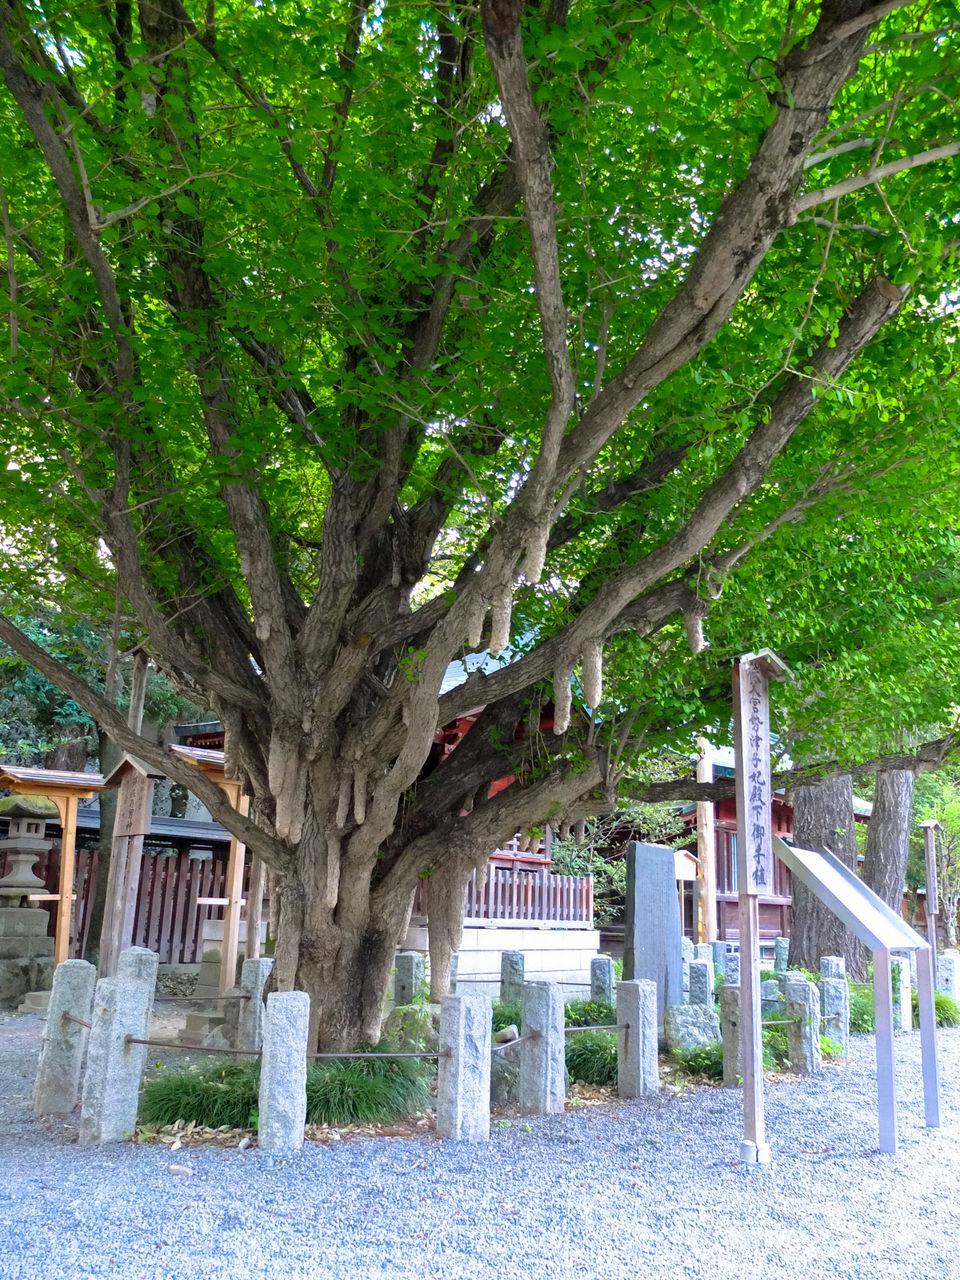 http://livedoor.blogimg.jp/kawagoerider/imgs/2/7/272681e4.jpg